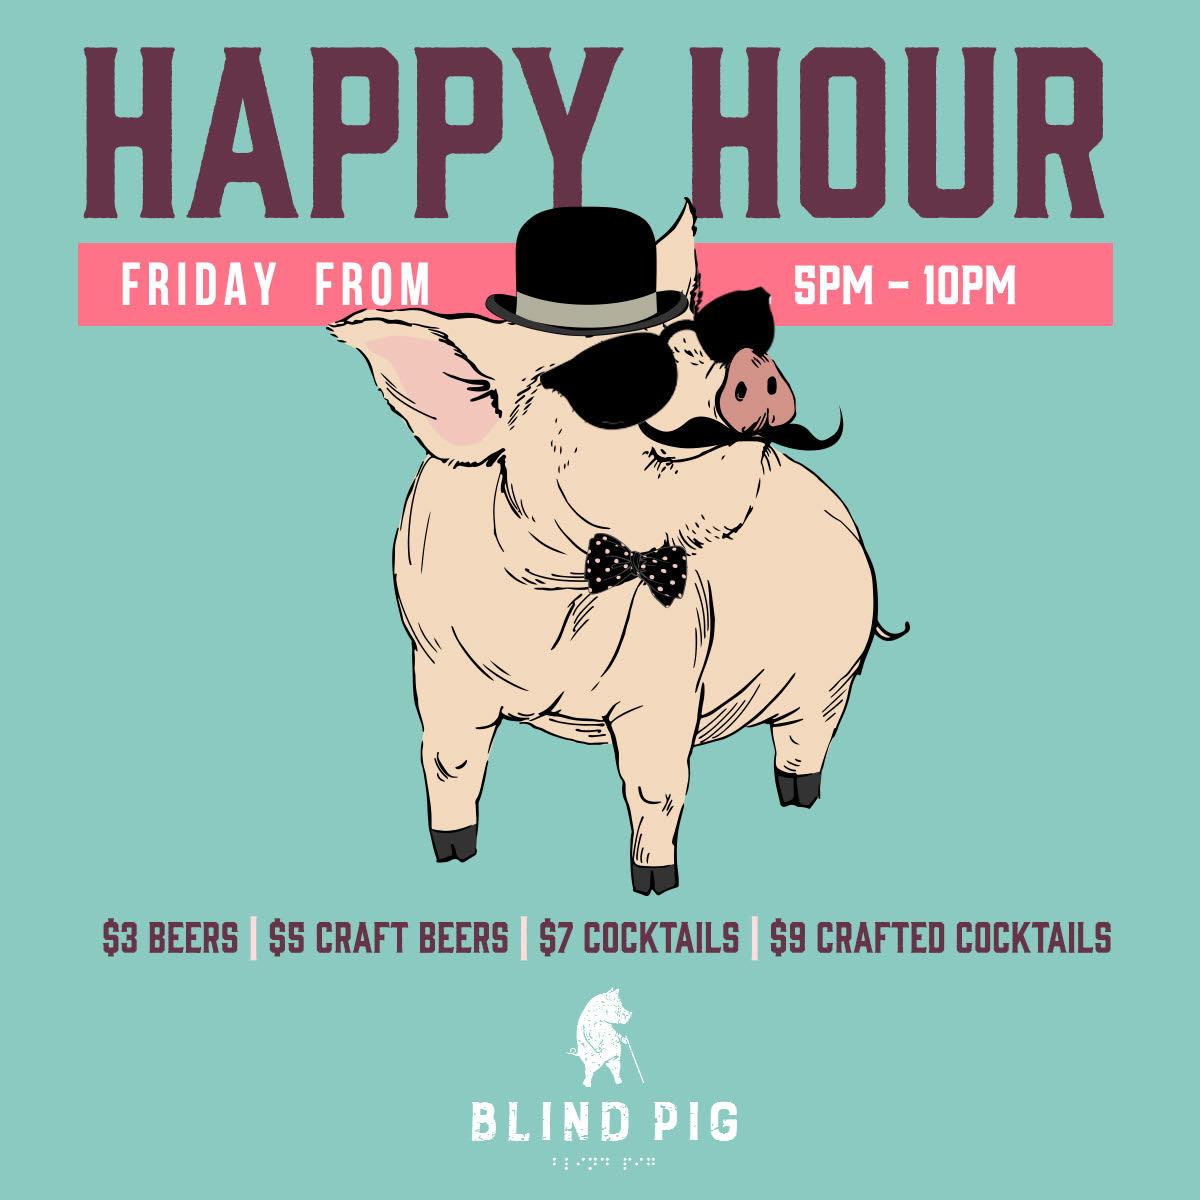 BLIND PIG HAPPY HOUR - FRIDAYS